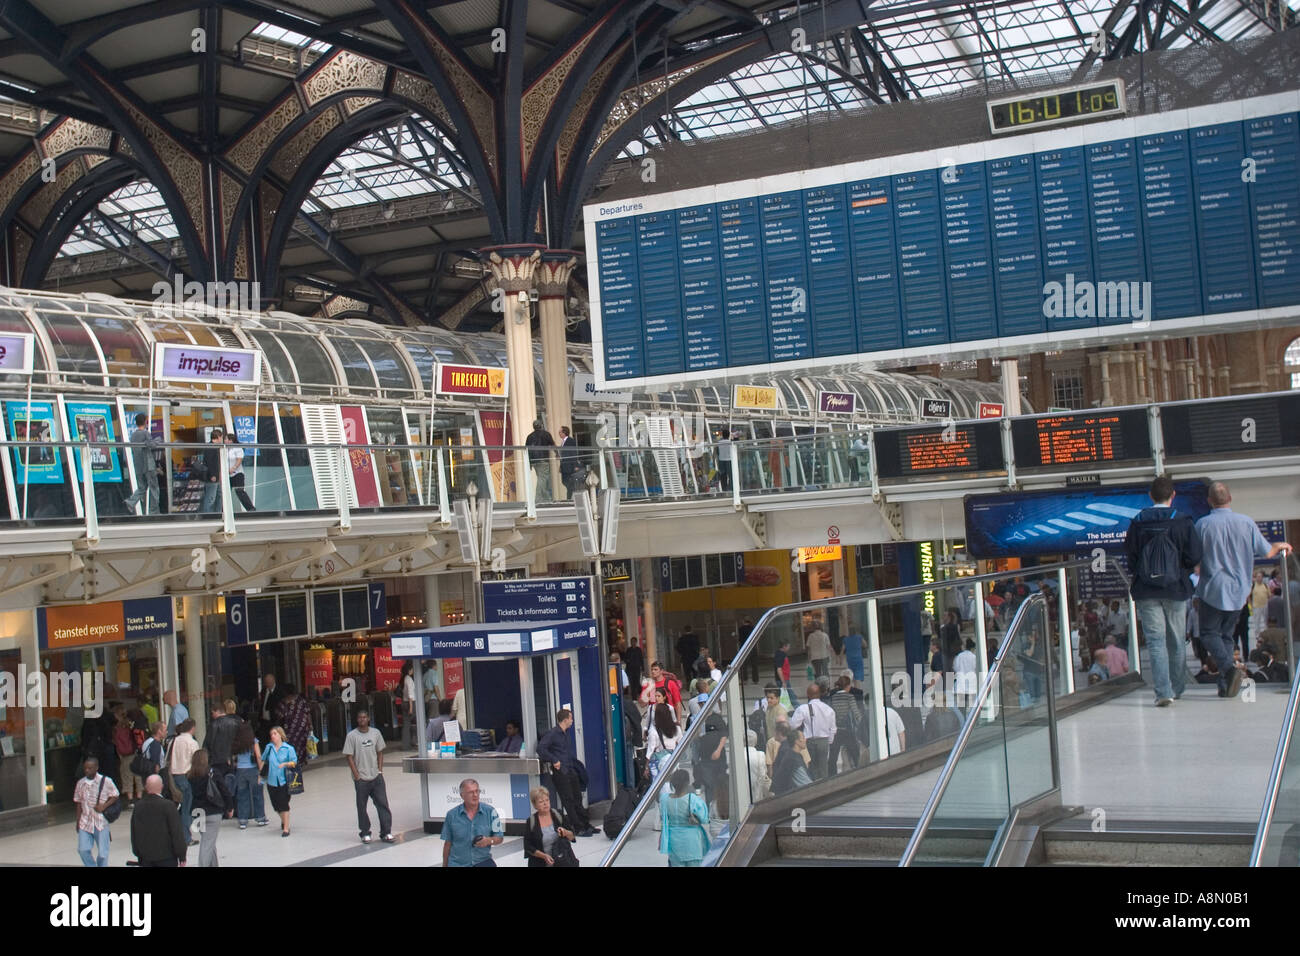 Liverpool Street Station City of London GB UK - Stock Image